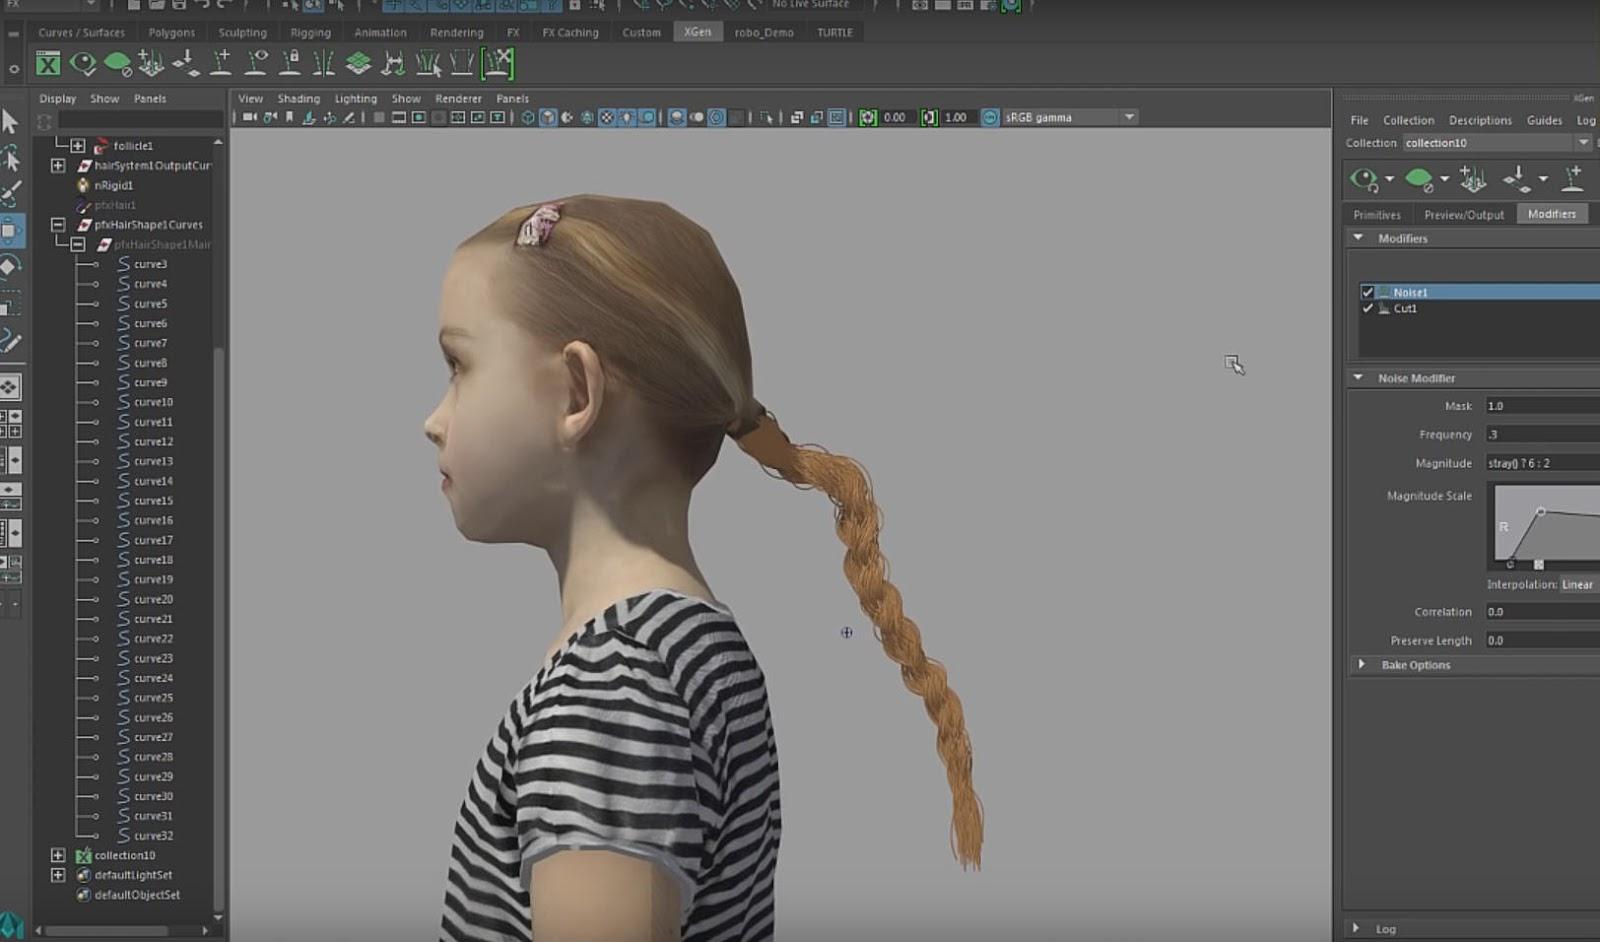 Autodesk Maya 2017 - Features and benefits (part I) | Kanisco